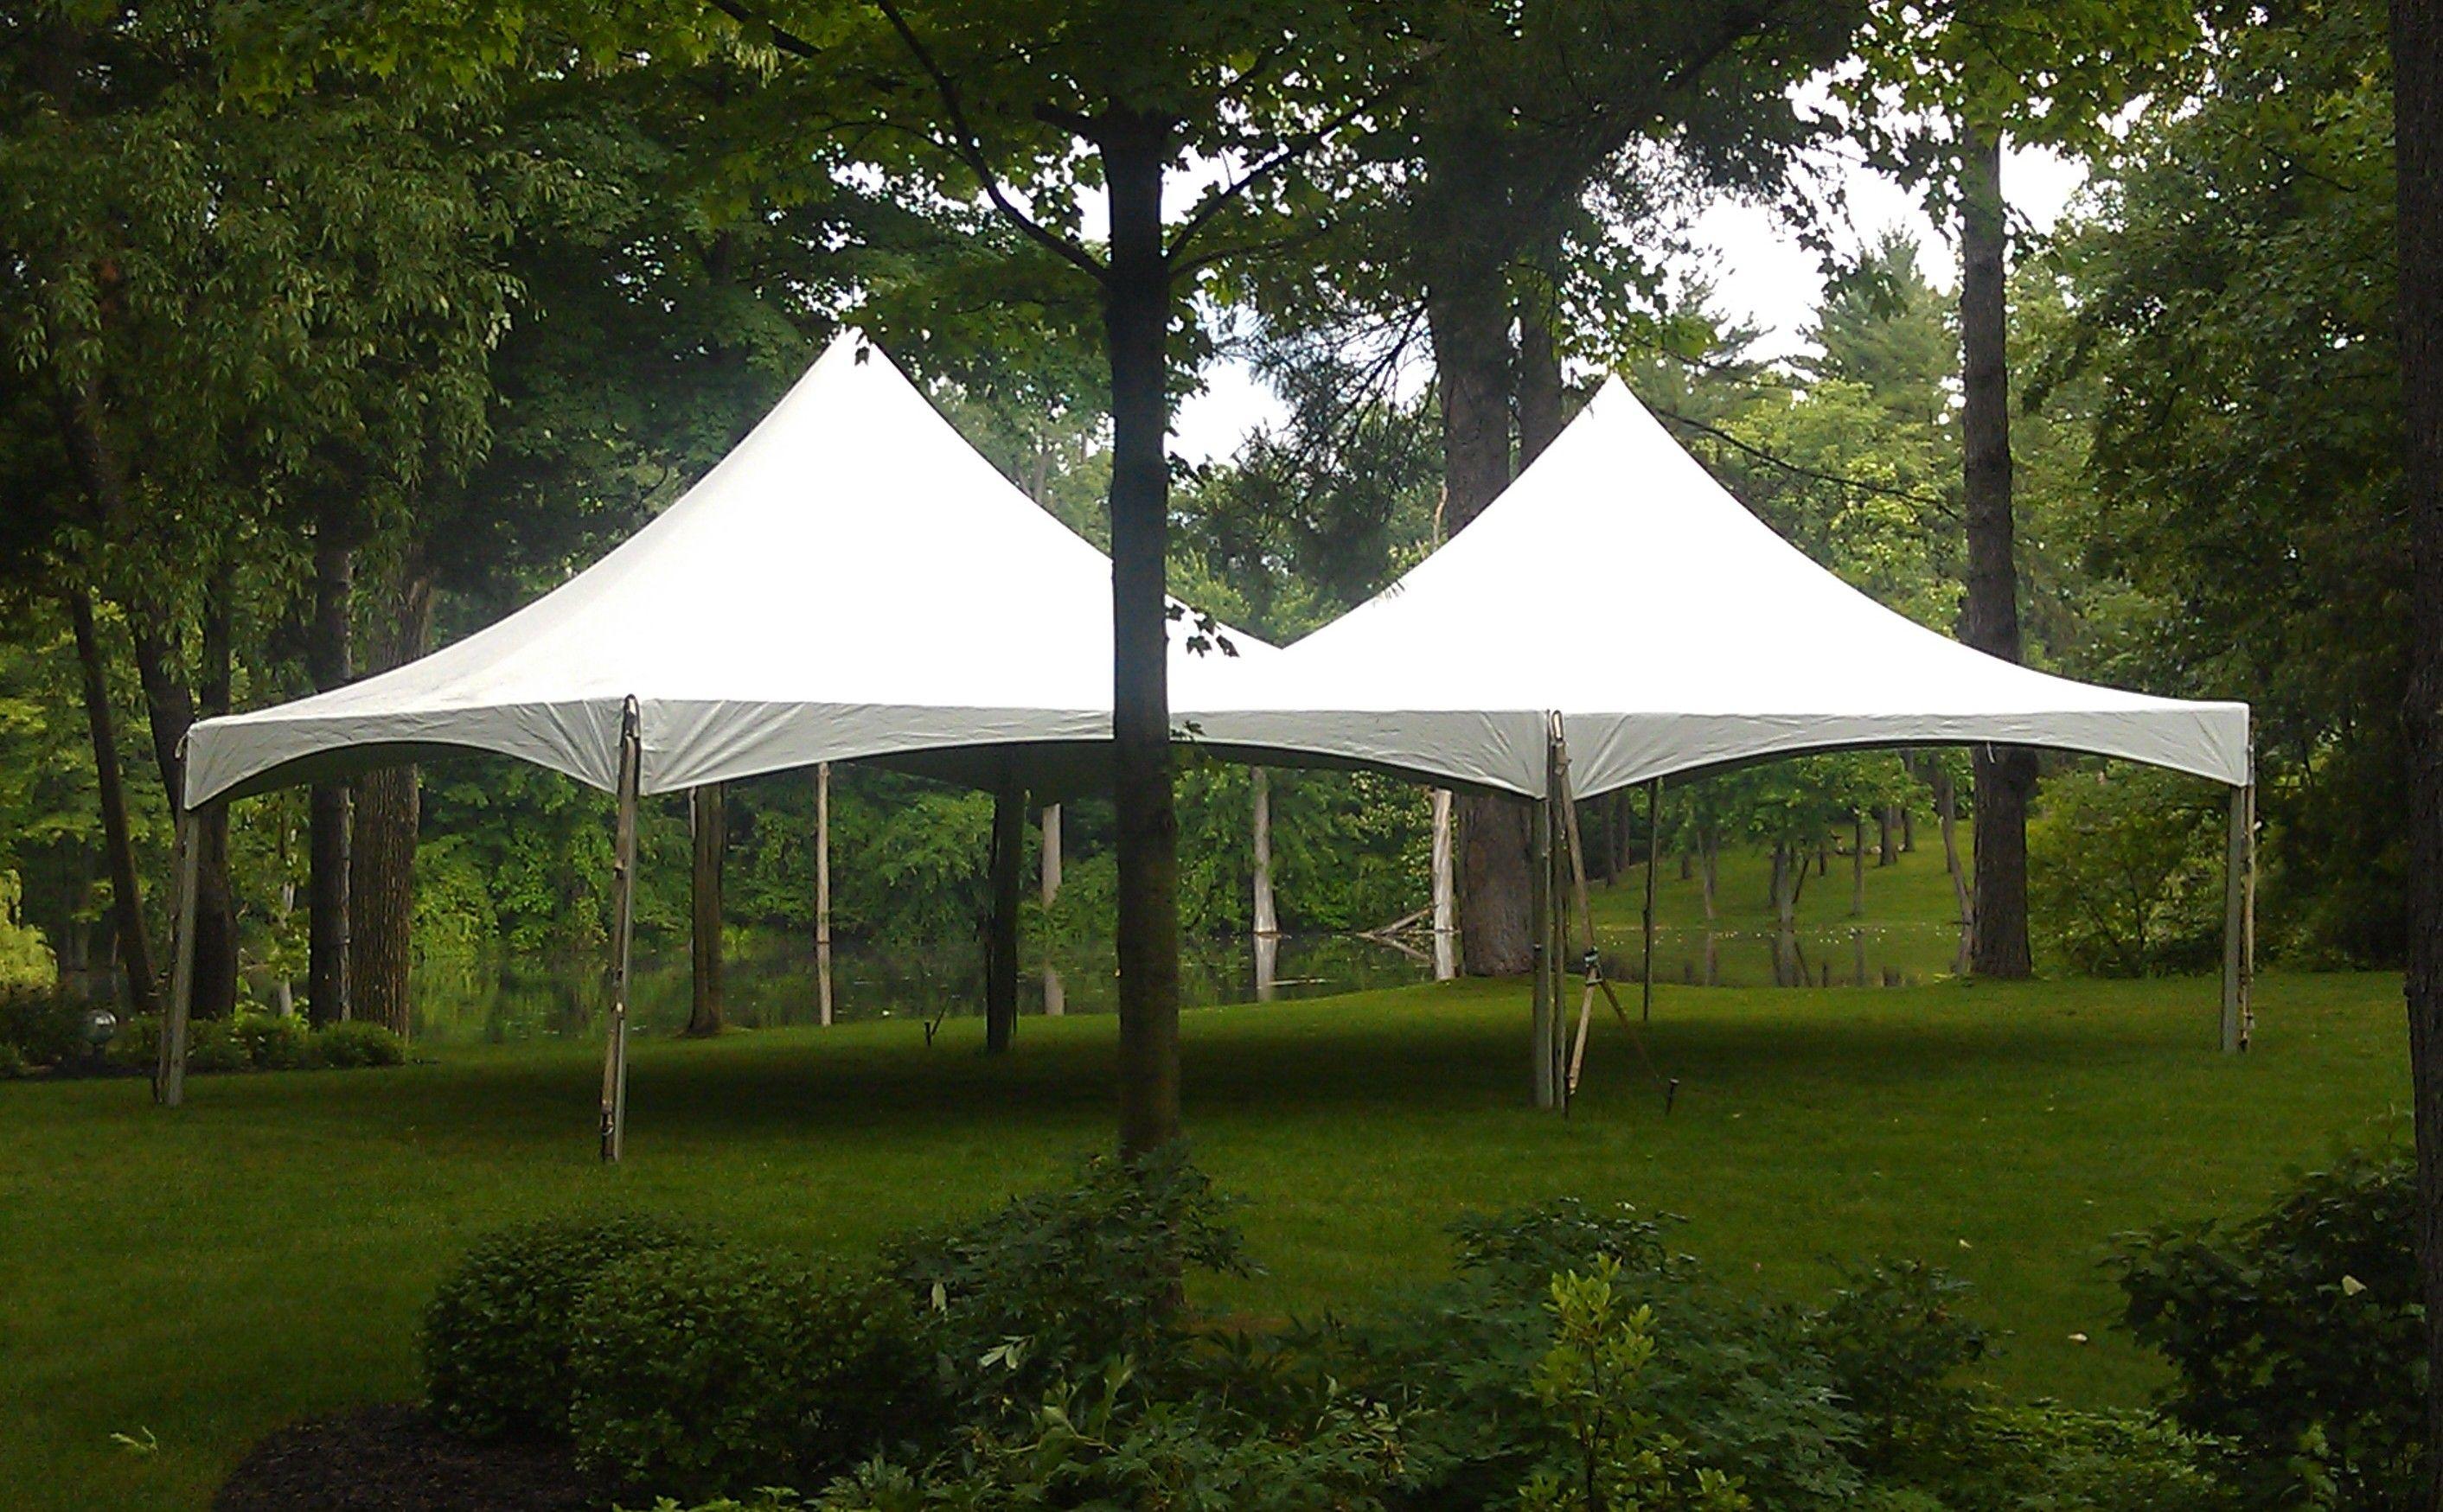 20 x 40 festival frame tent for a beautiful backyard wedding. 844-TENT PRO & 20 x 40 festival frame tent for a beautiful backyard wedding. 844 ...